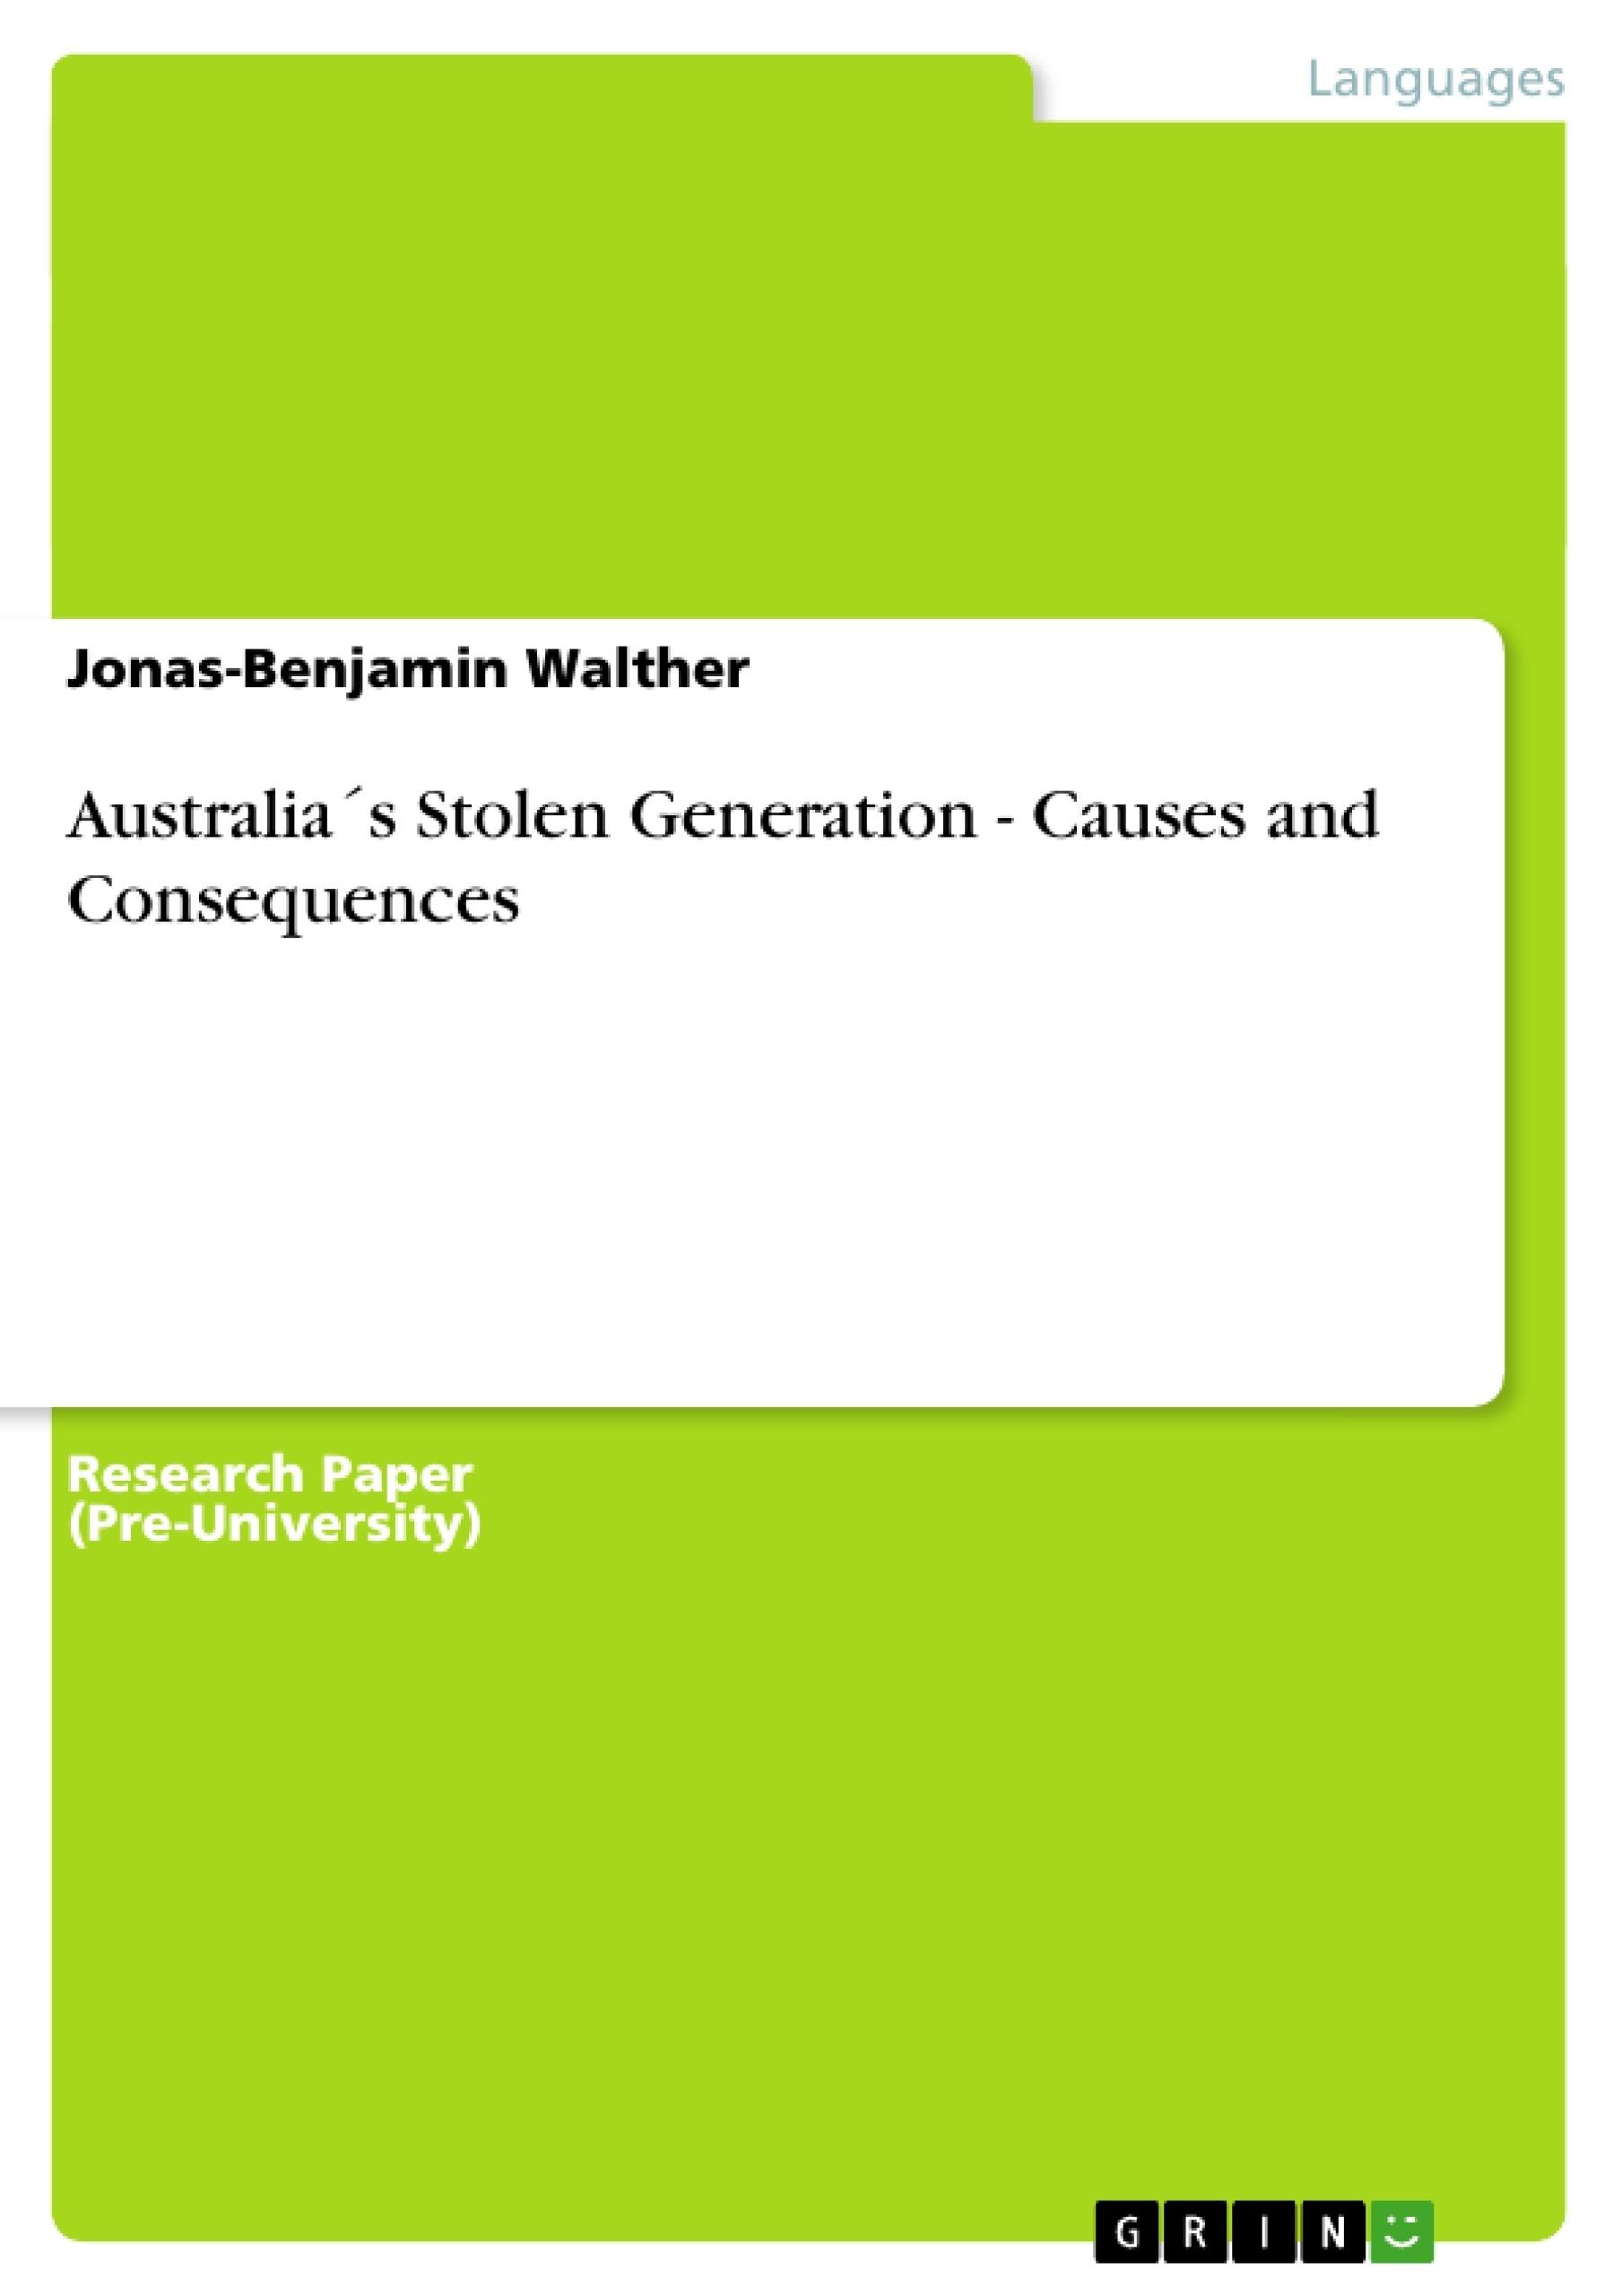 004 Essay On The Stolen Generation 106643 0 Singular Questions Indigenous Studies Reflection Full